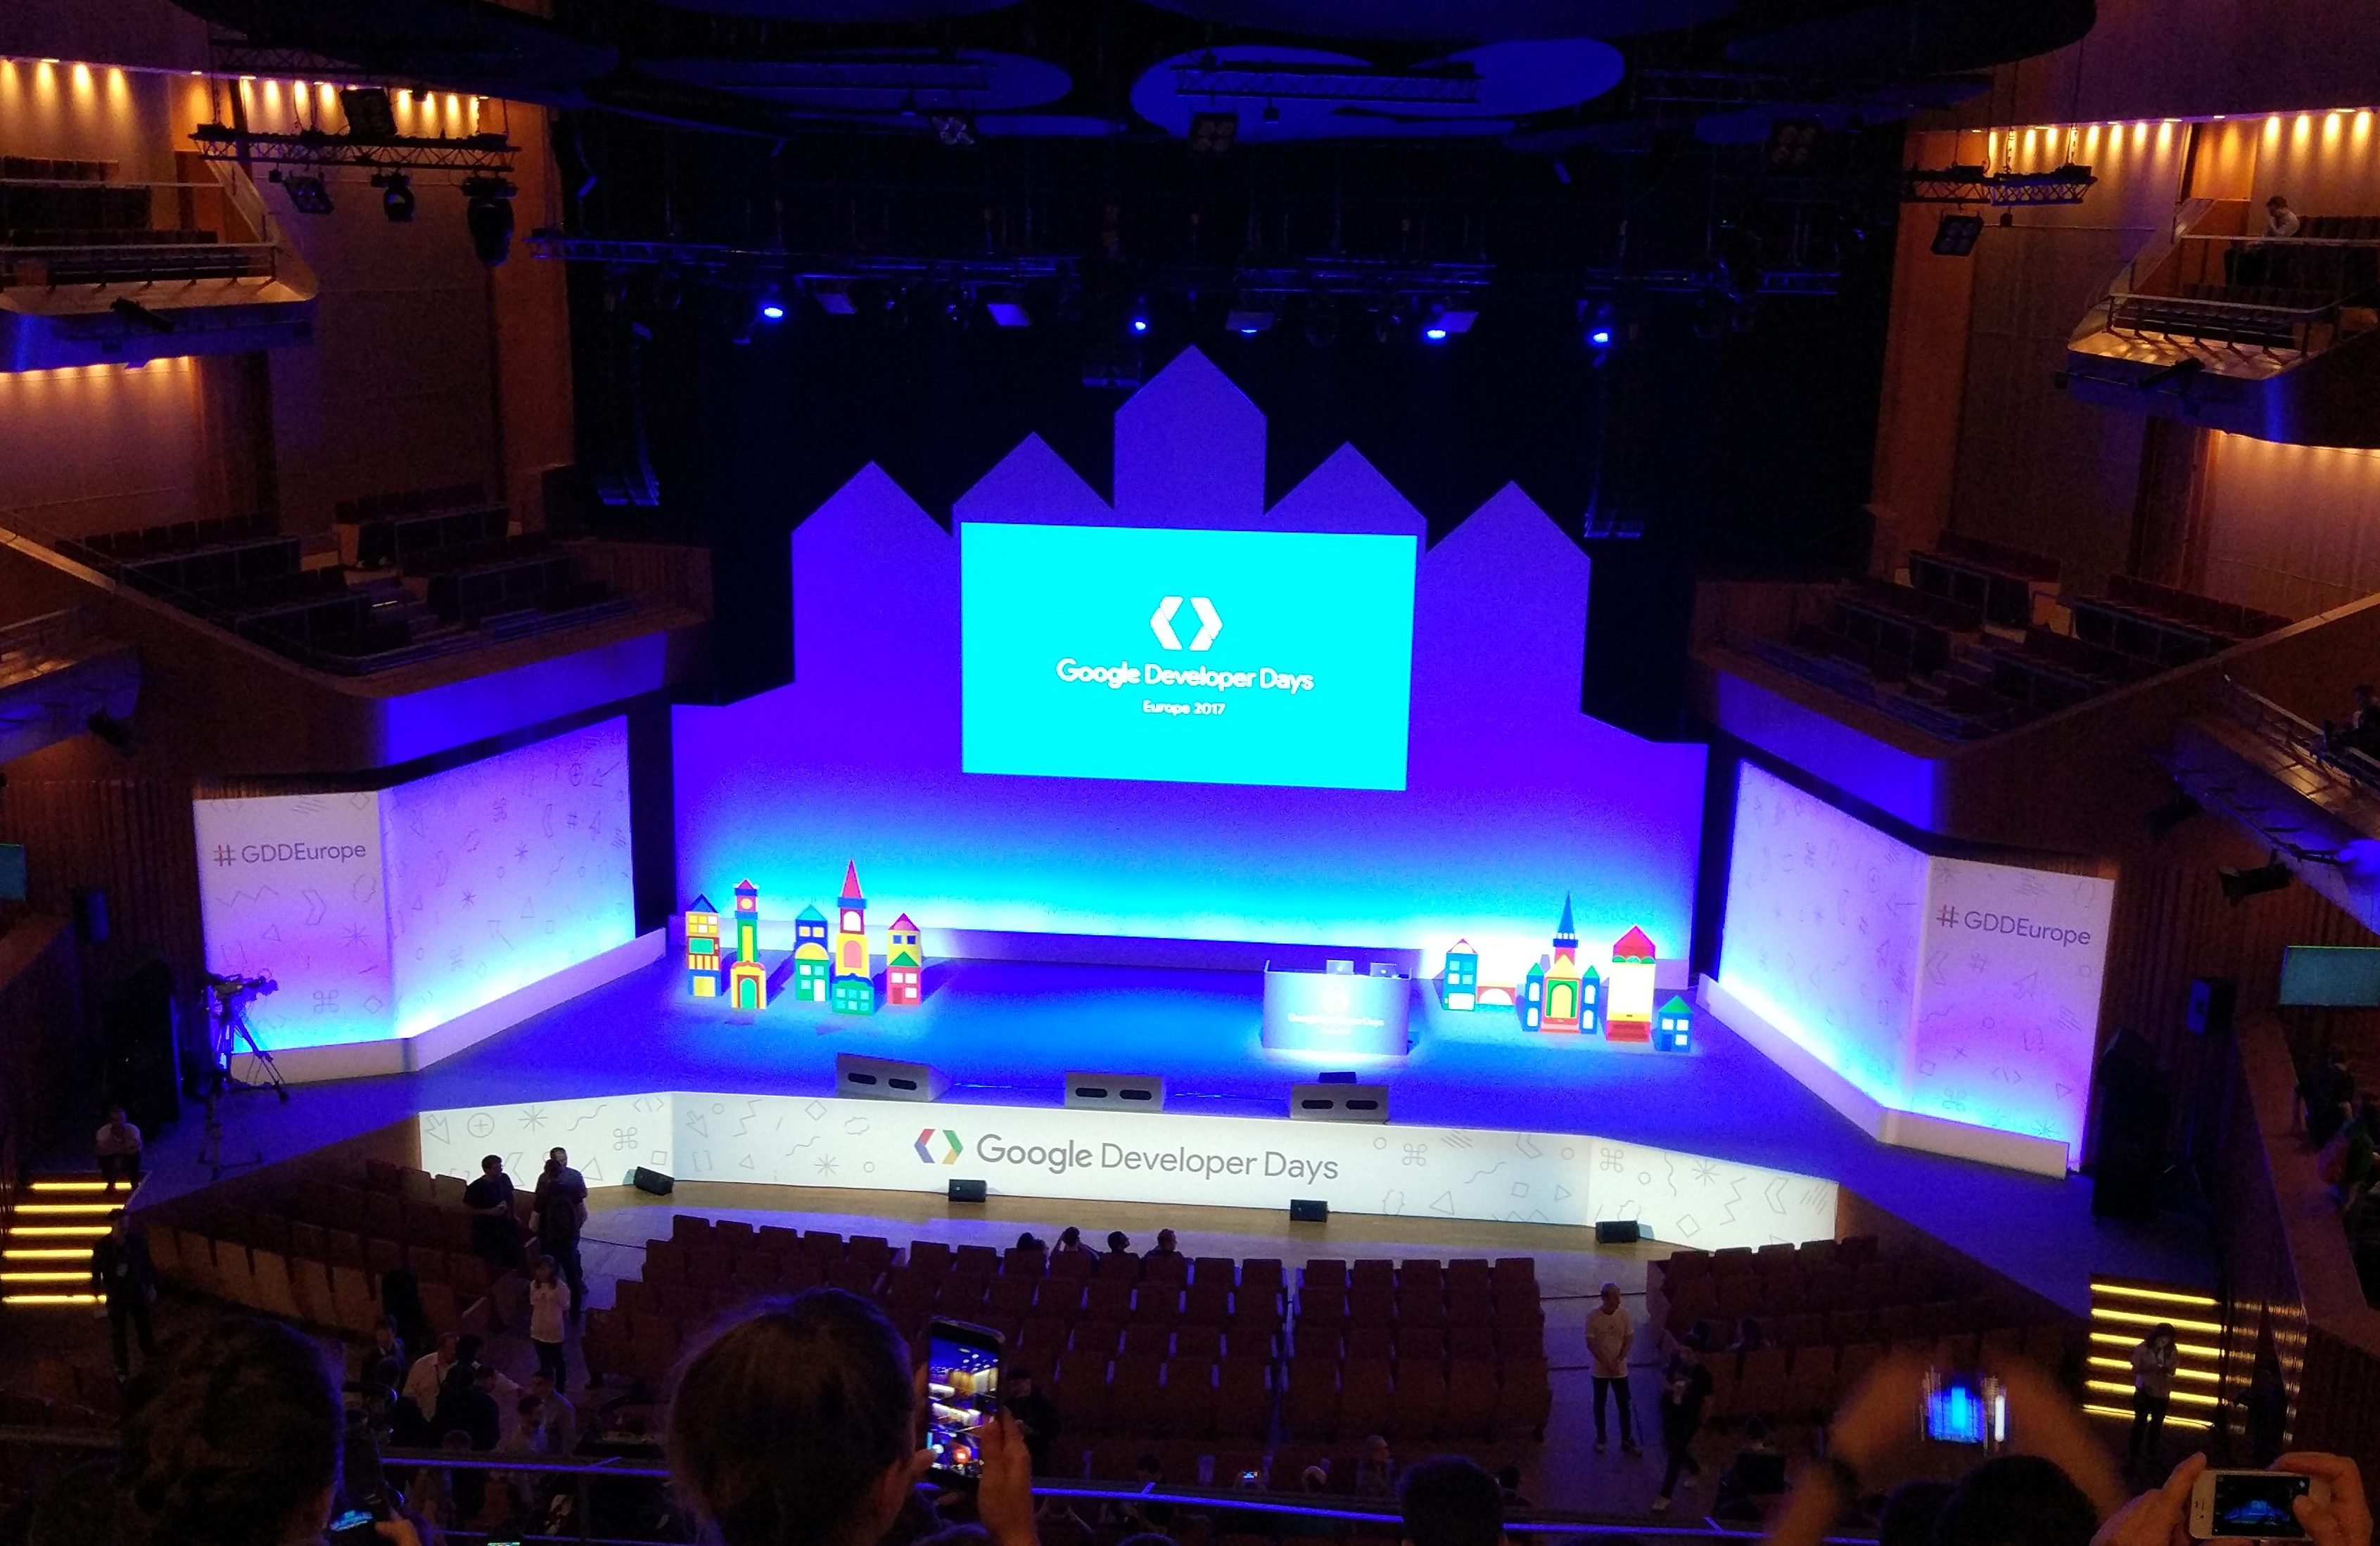 Webové technológie, machine learning či augmented reality: ako bolo na Google Developer Days v Krakowe? 5